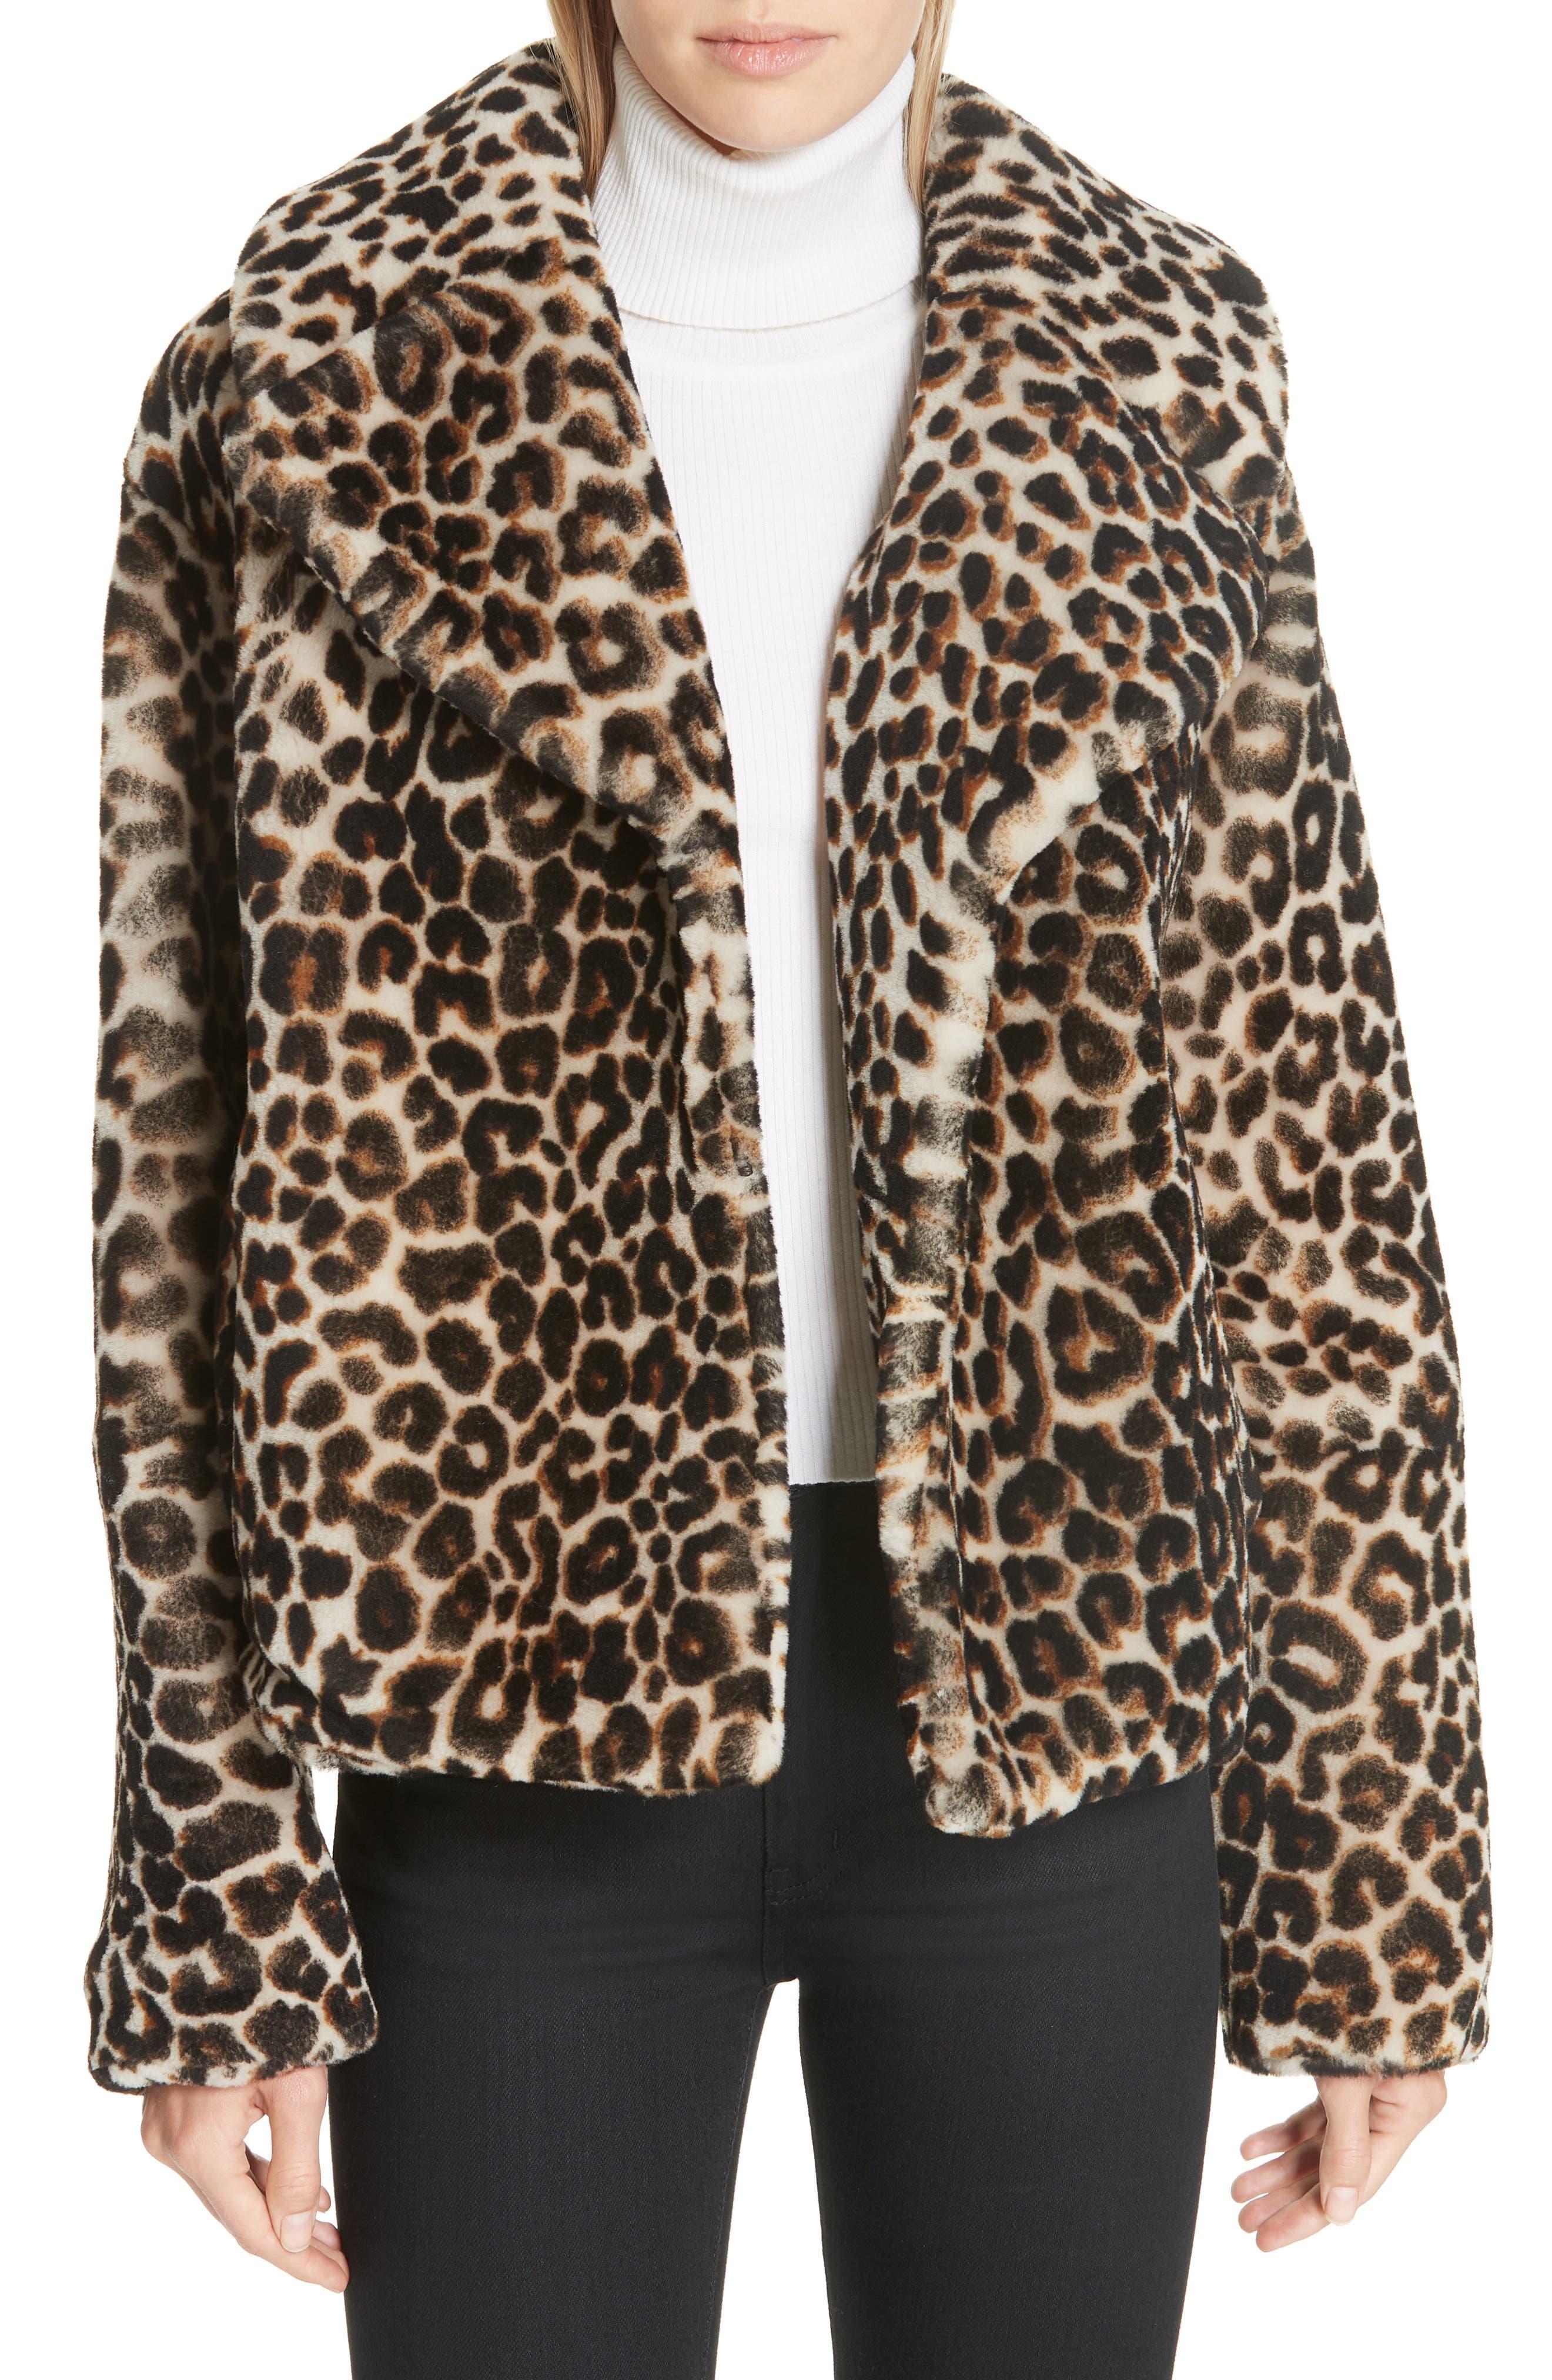 A.l.c. Grant Leopard Print Genuine Shearling Jacket, Ivory